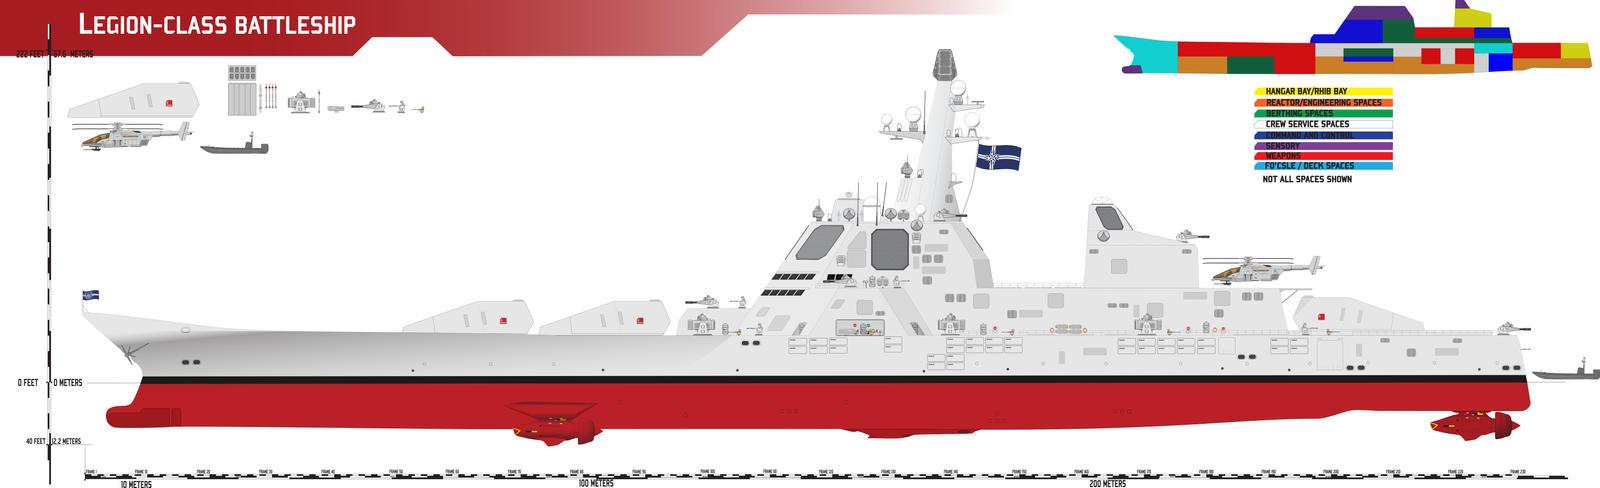 Legion-class Battleship by Afterskies